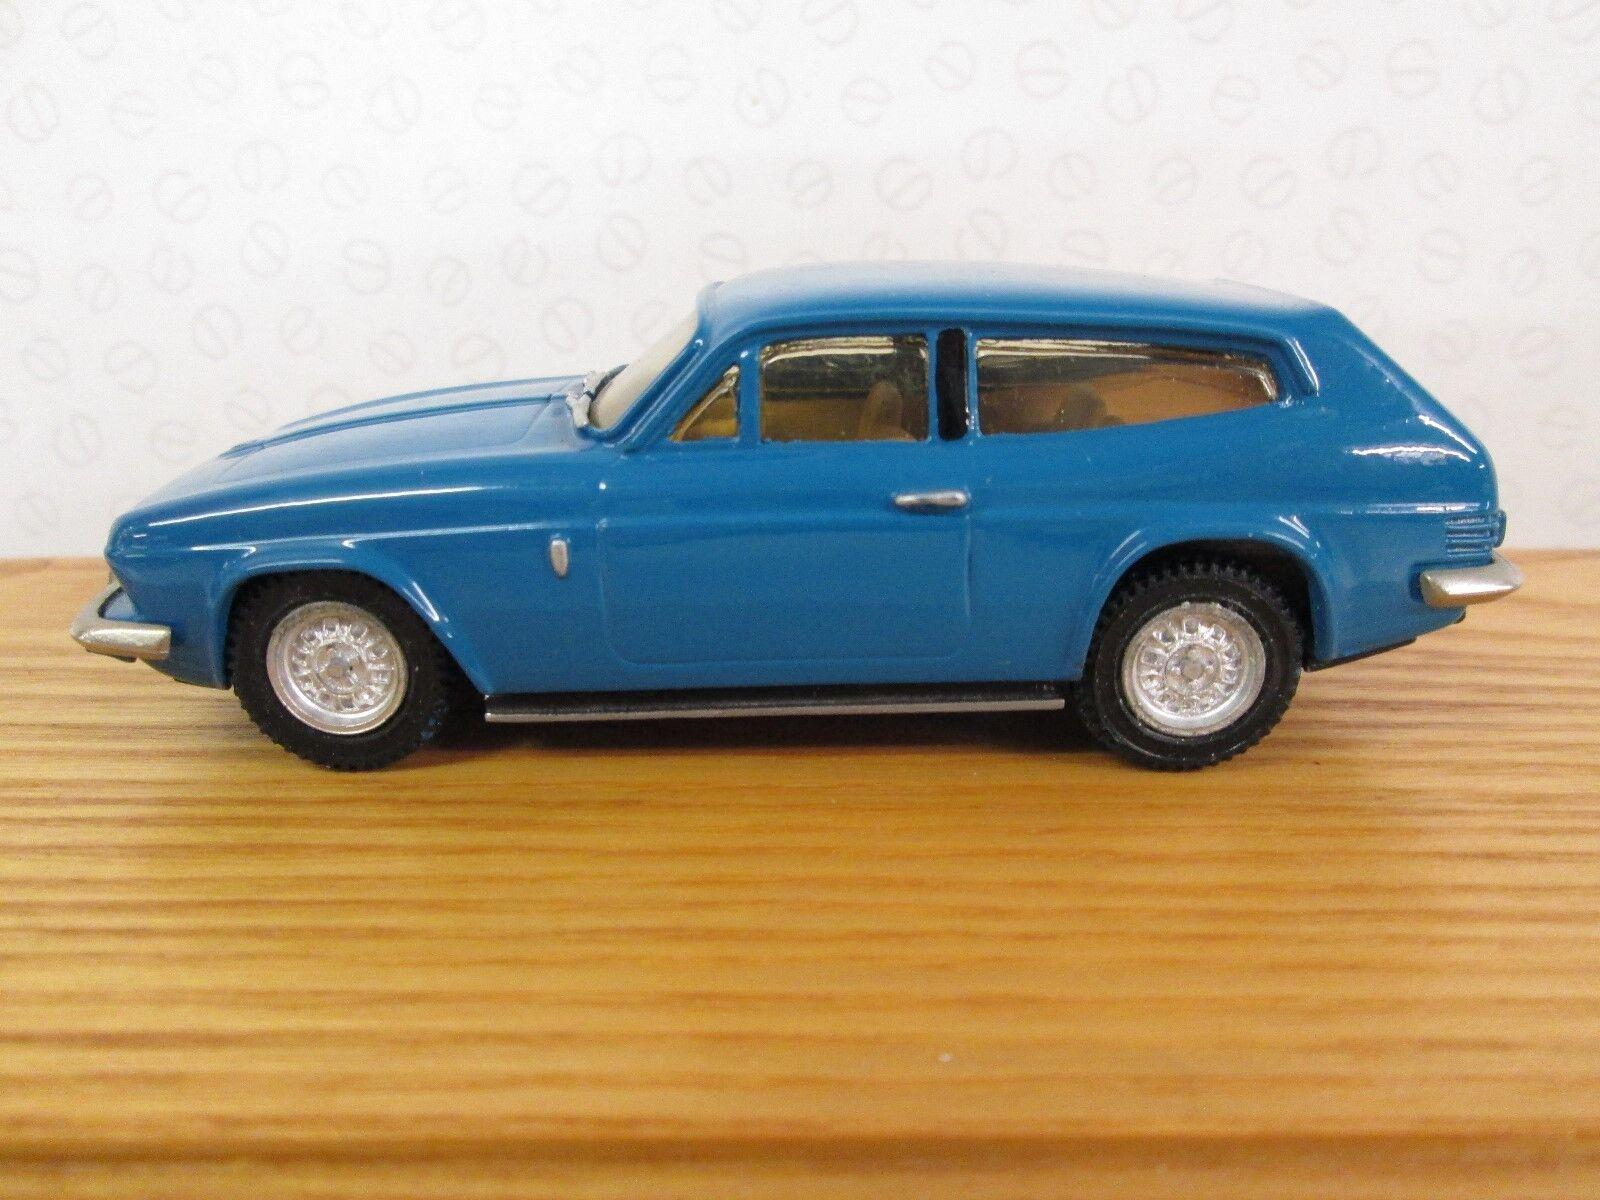 PATHFINDER MODELS. Reliant Scimitar GTE SE5a. blueE. 1972. 1 43. PFM5